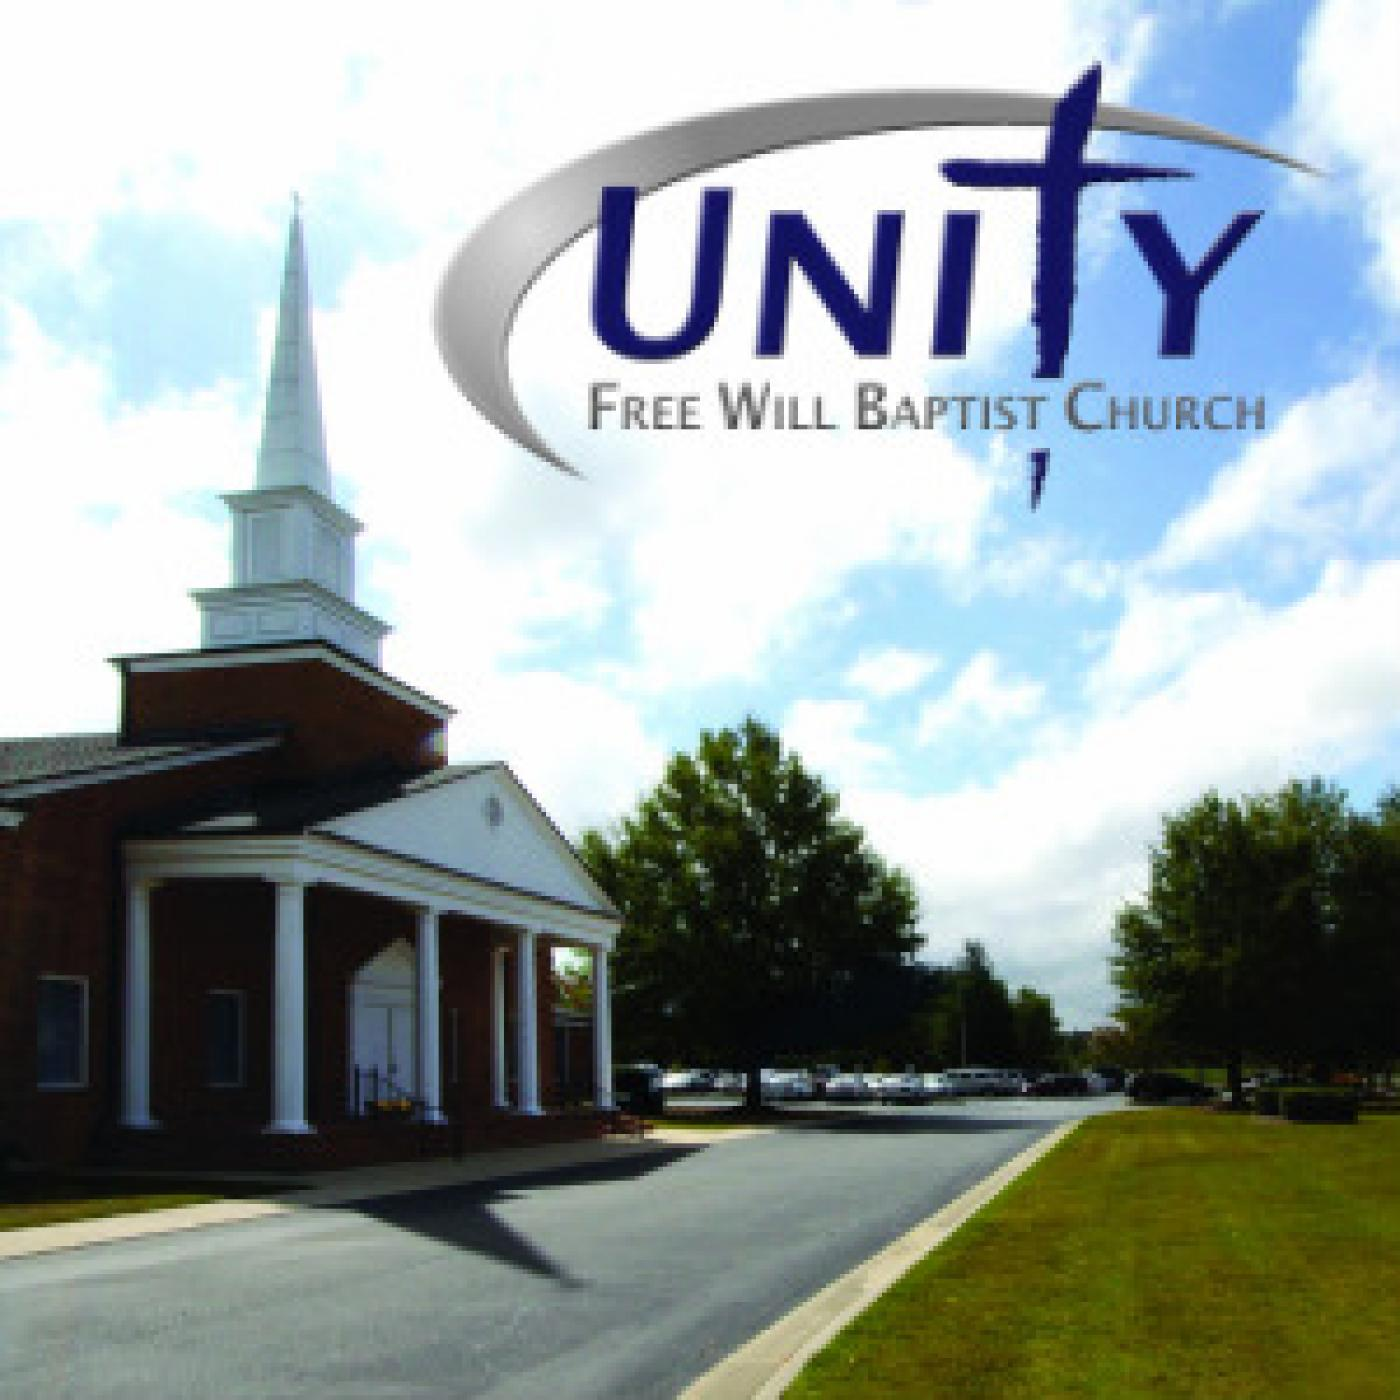 Unity Free Will Baptist Church